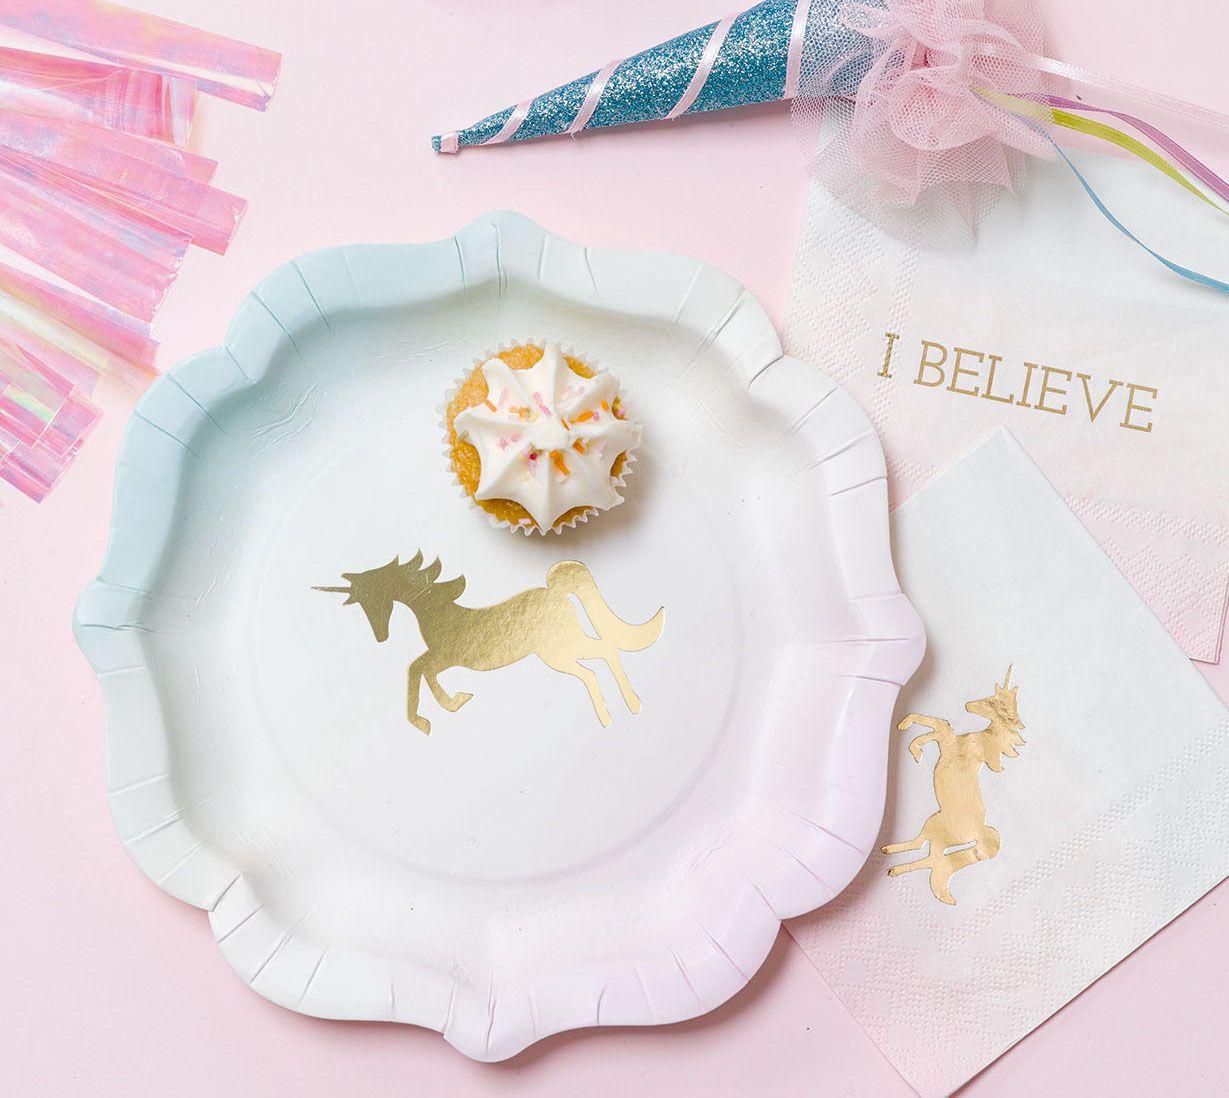 Gold Foil Unicorn Plates And Napkins